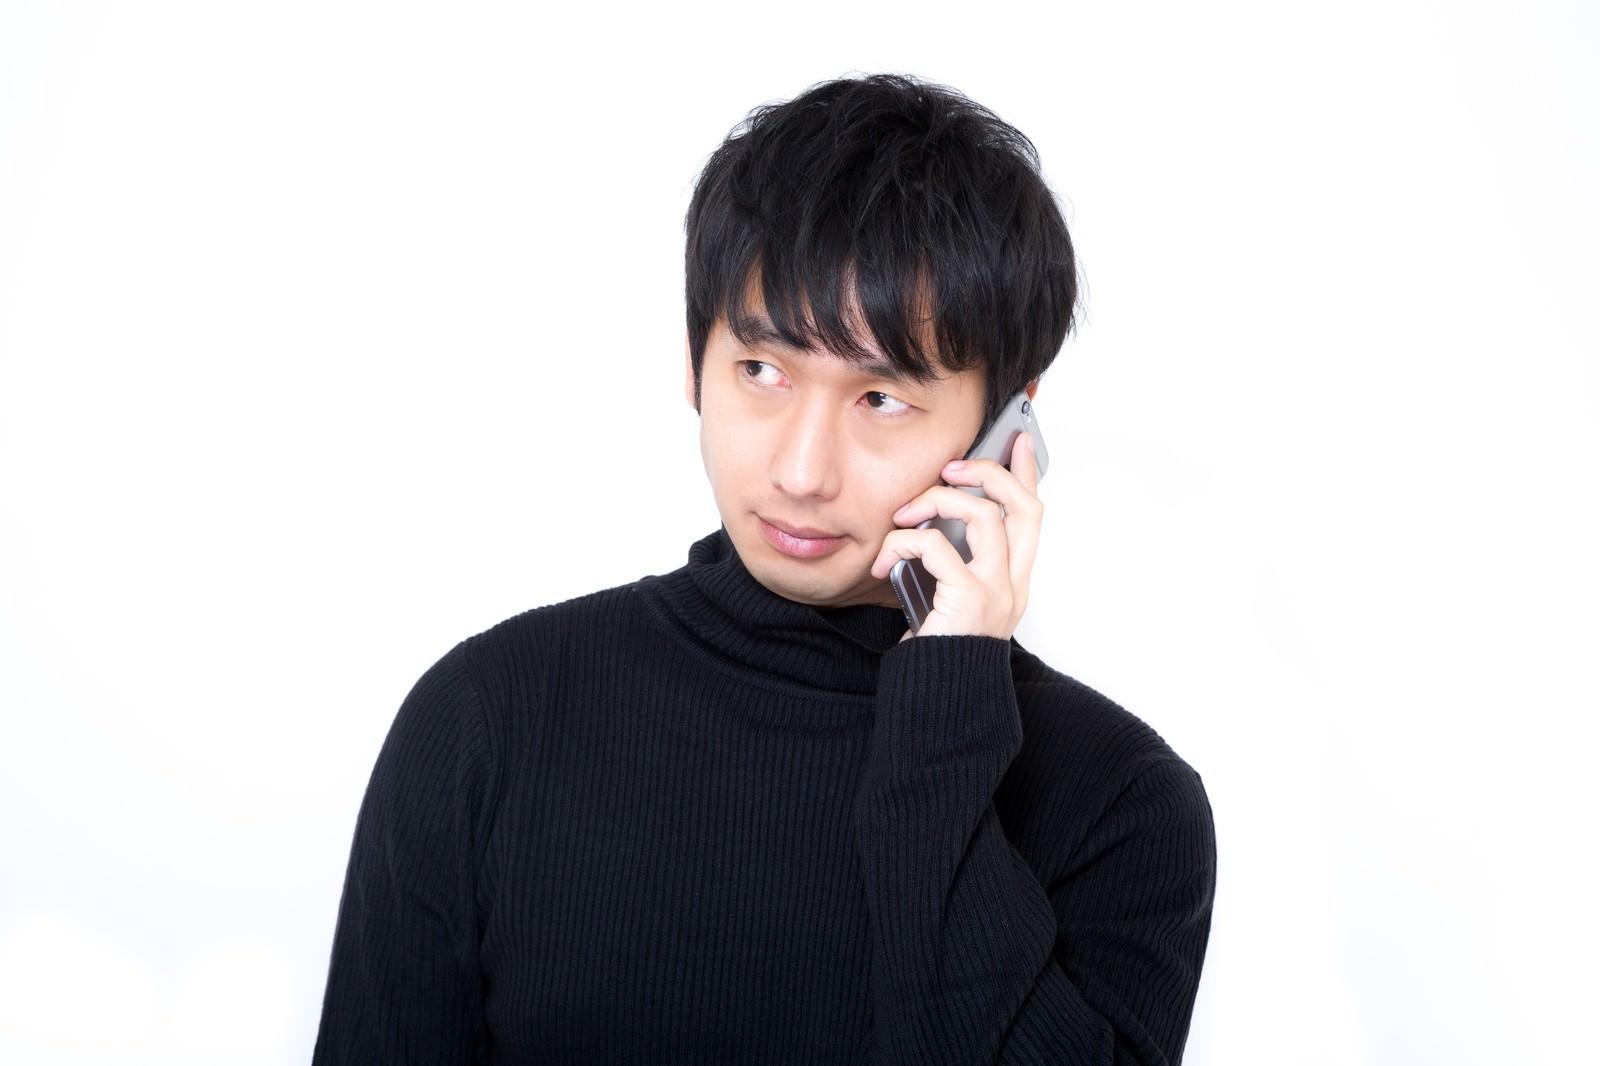 https://www.pakutaso.com/shared/img/thumb/OK76_telsuruta-toru20141221140154_TP_V.jpg